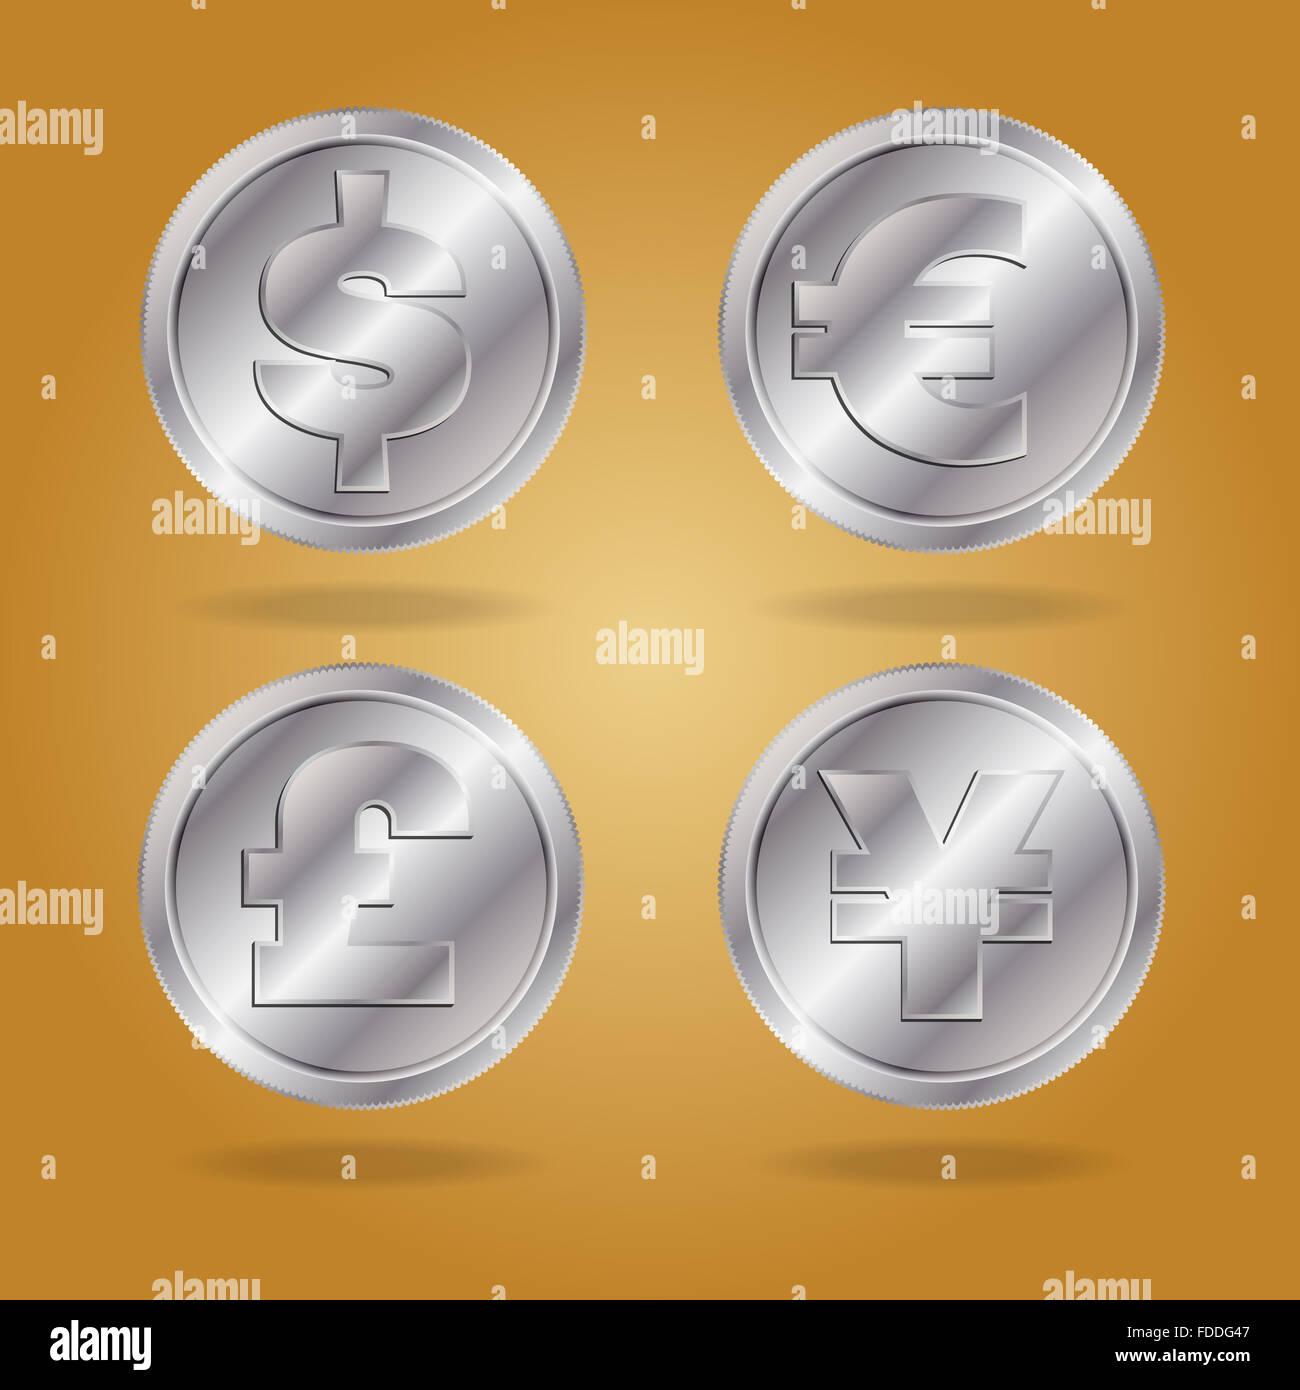 Symbols of various currencies dollar euro pound and yen or yuan symbols of various currencies dollar euro pound and yen or yuan on silver coins biocorpaavc